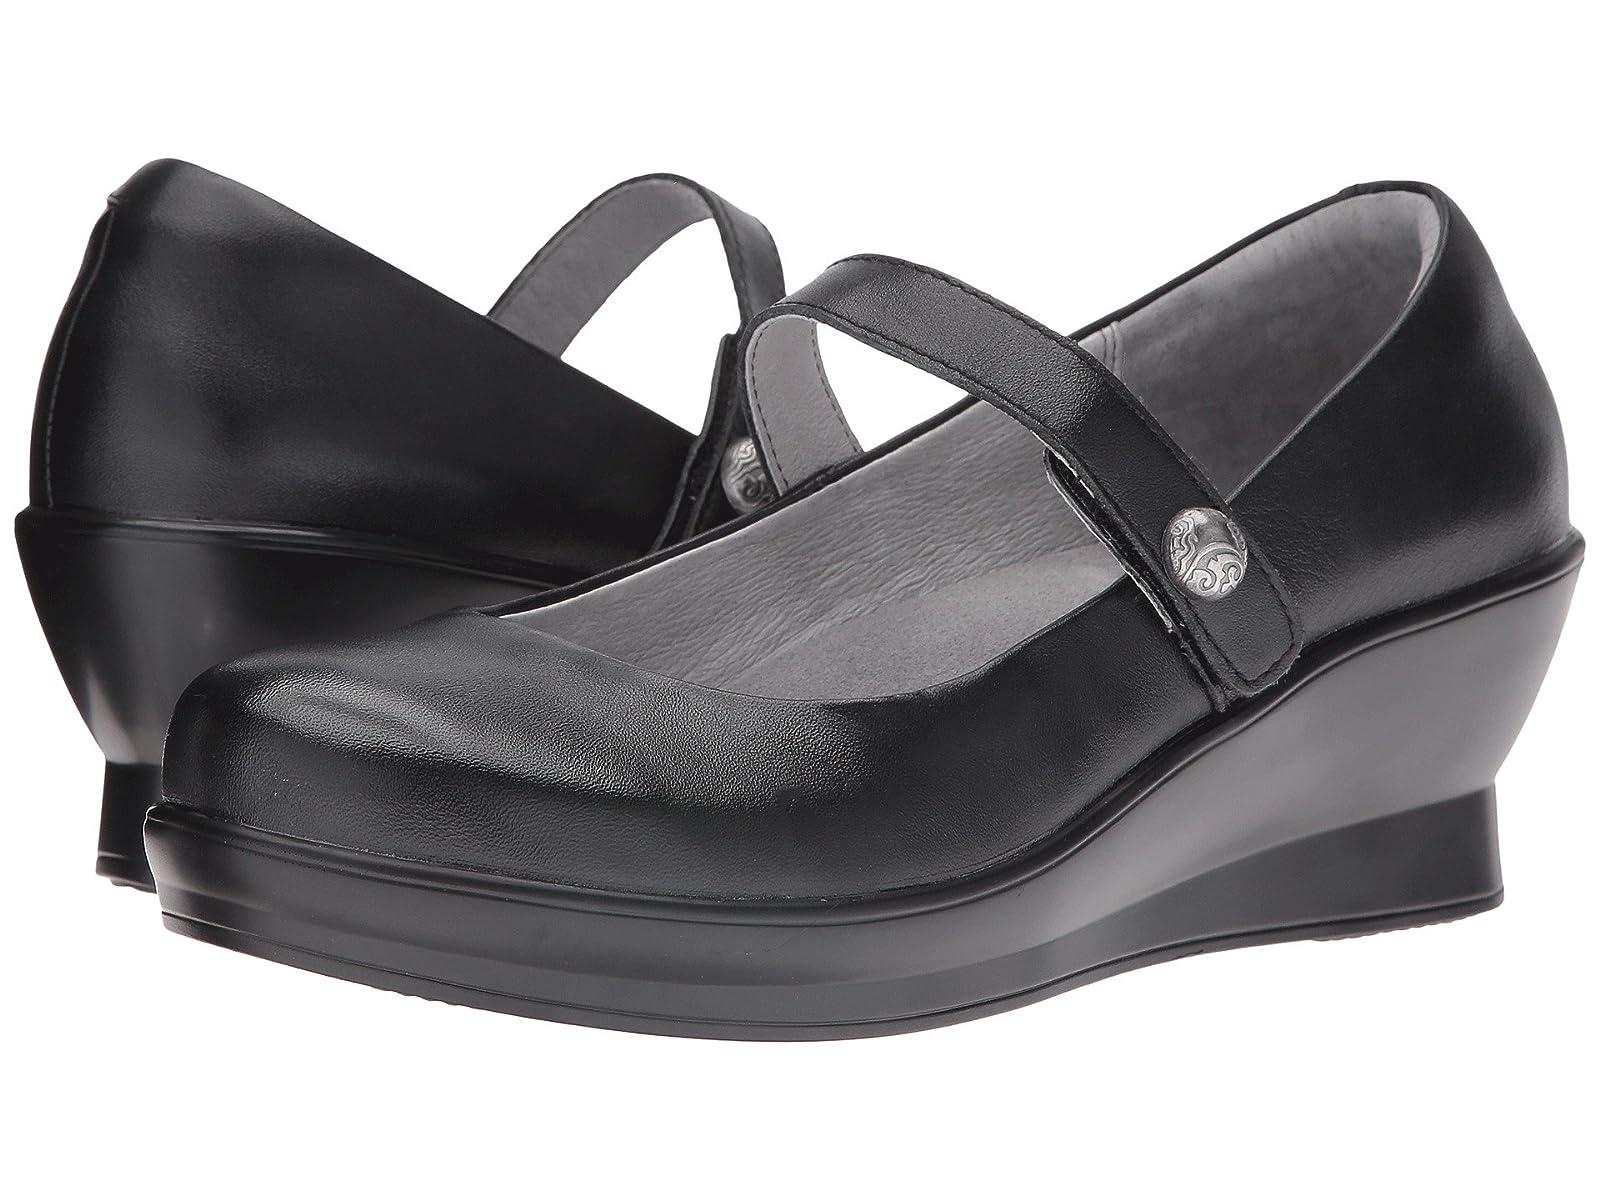 Alegria FlairCheap and distinctive eye-catching shoes